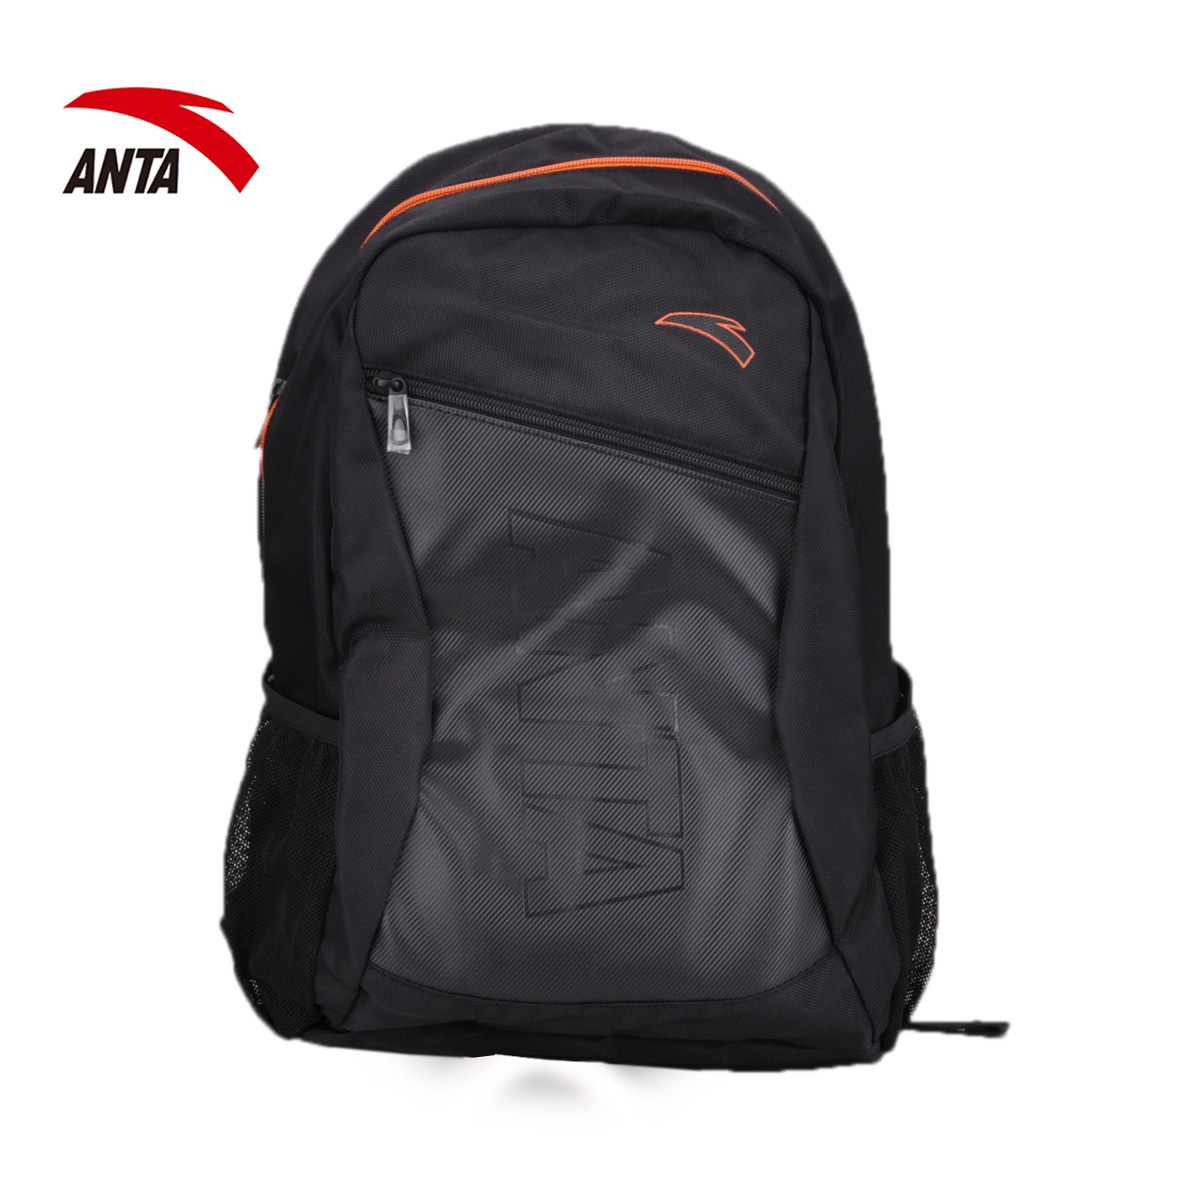 Туристический рюкзак Anta 19347159 2013 R1 Anta / Anta